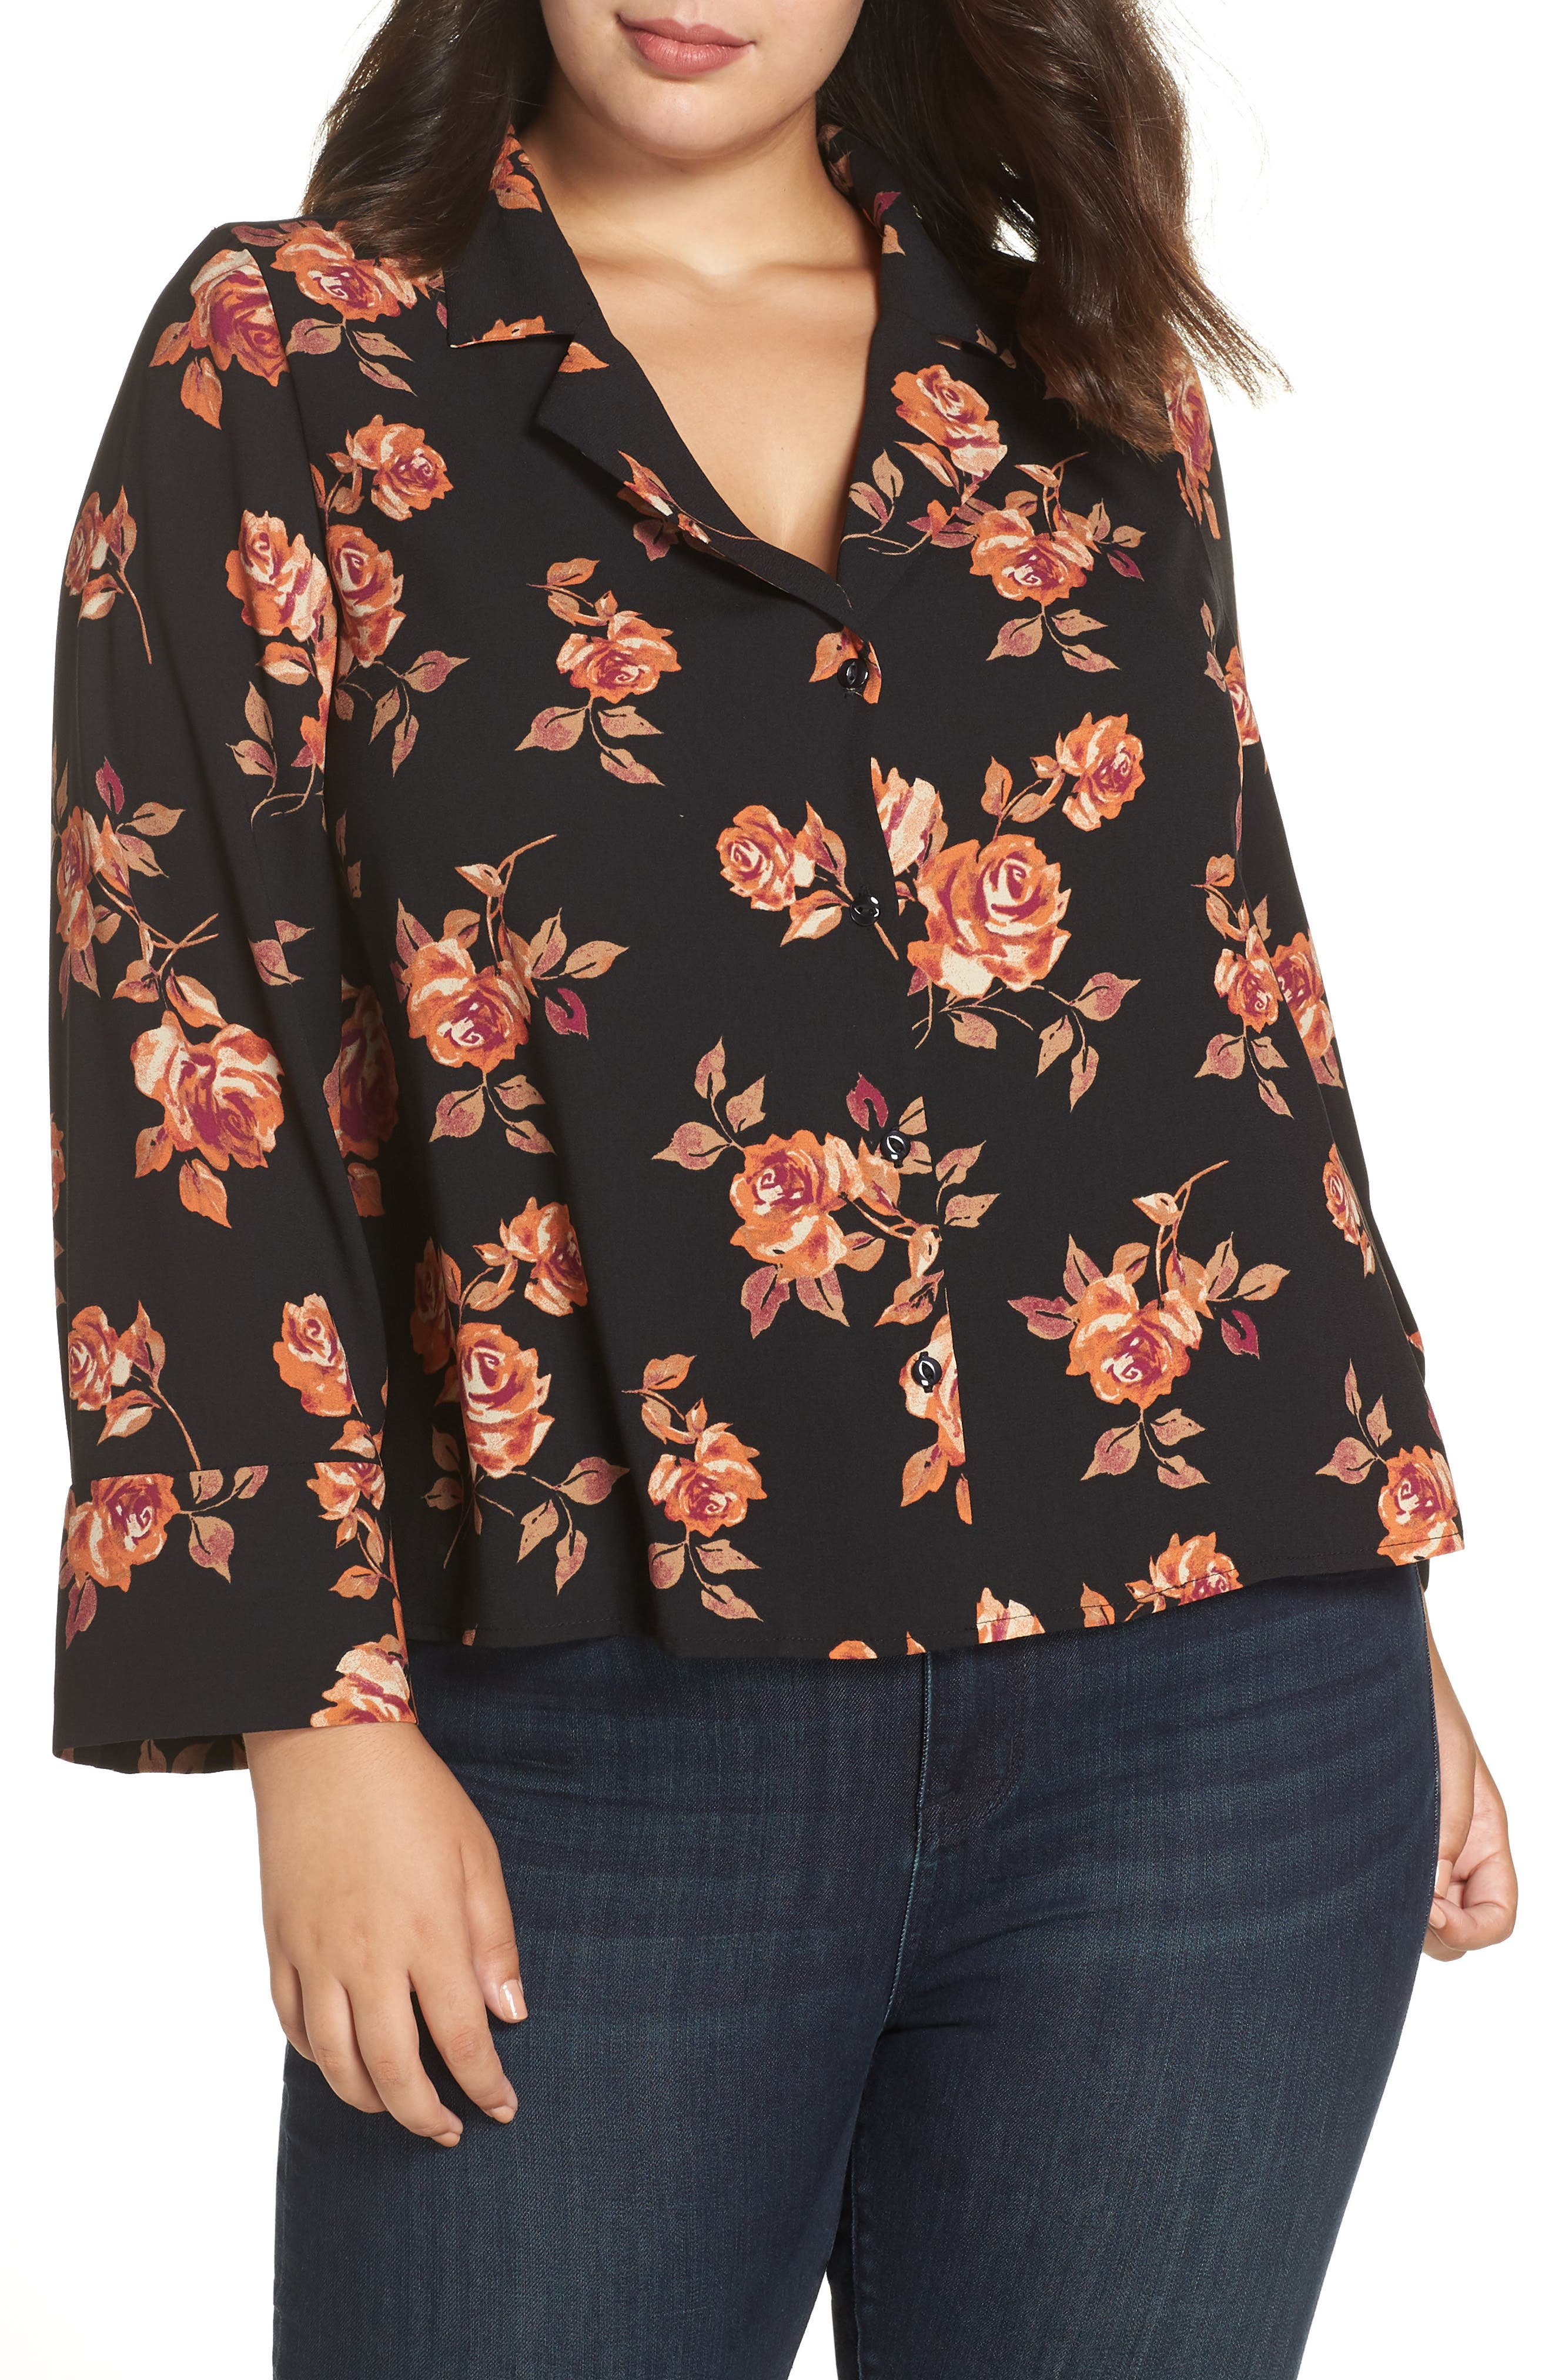 Notched Collar Floral Print Shirt,                             Main thumbnail 1, color,                             BLACK POP FLORAL